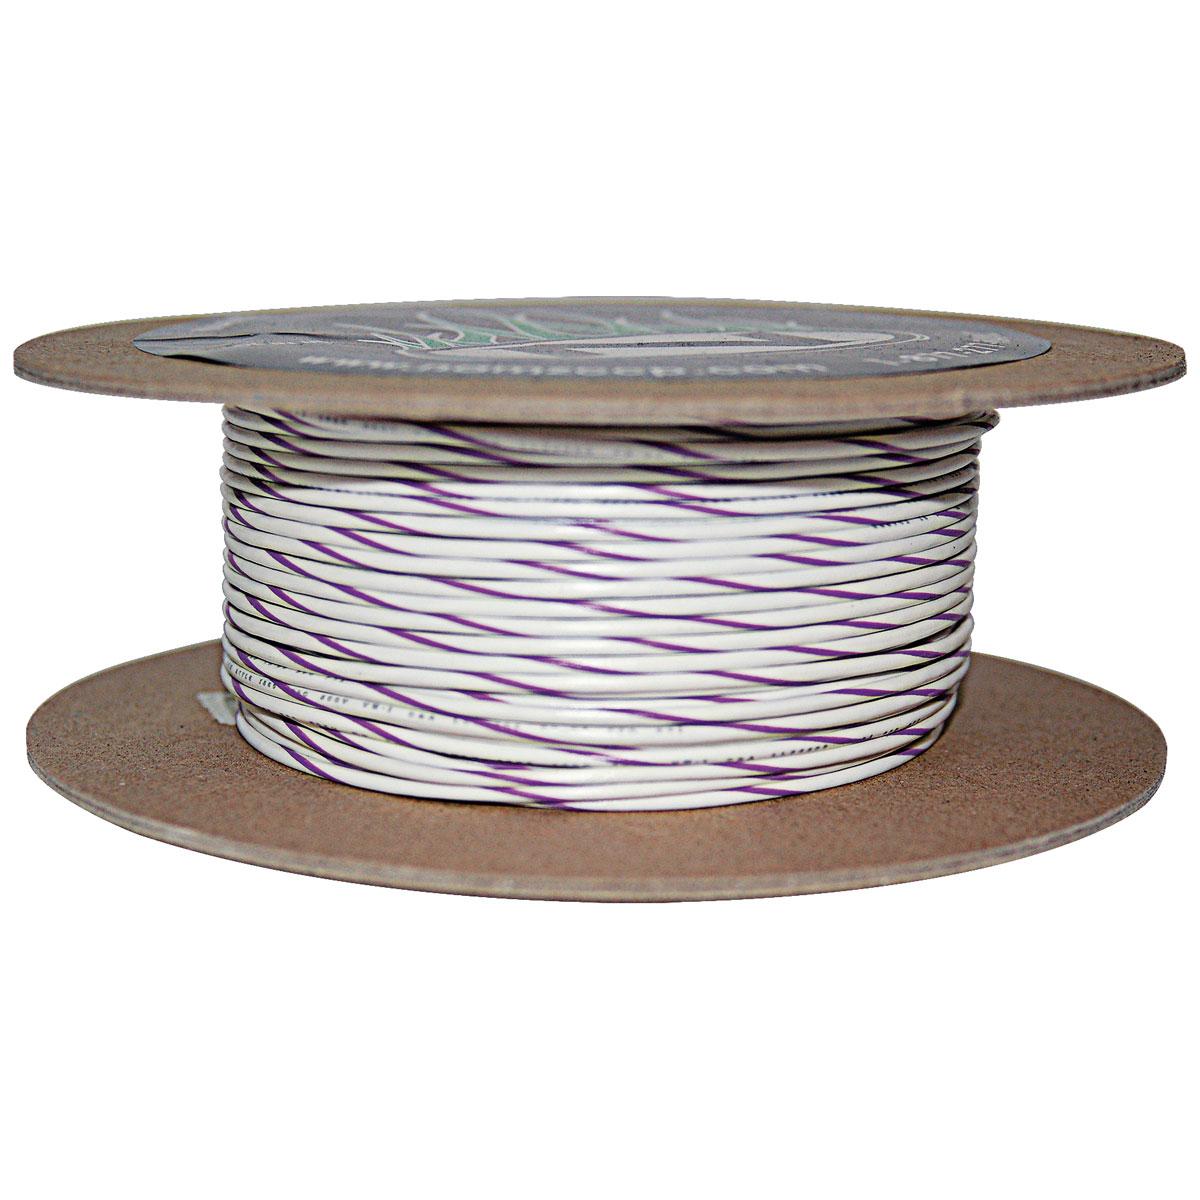 NAMZ Custom Cycle White/Violet 18-Gauge Wire